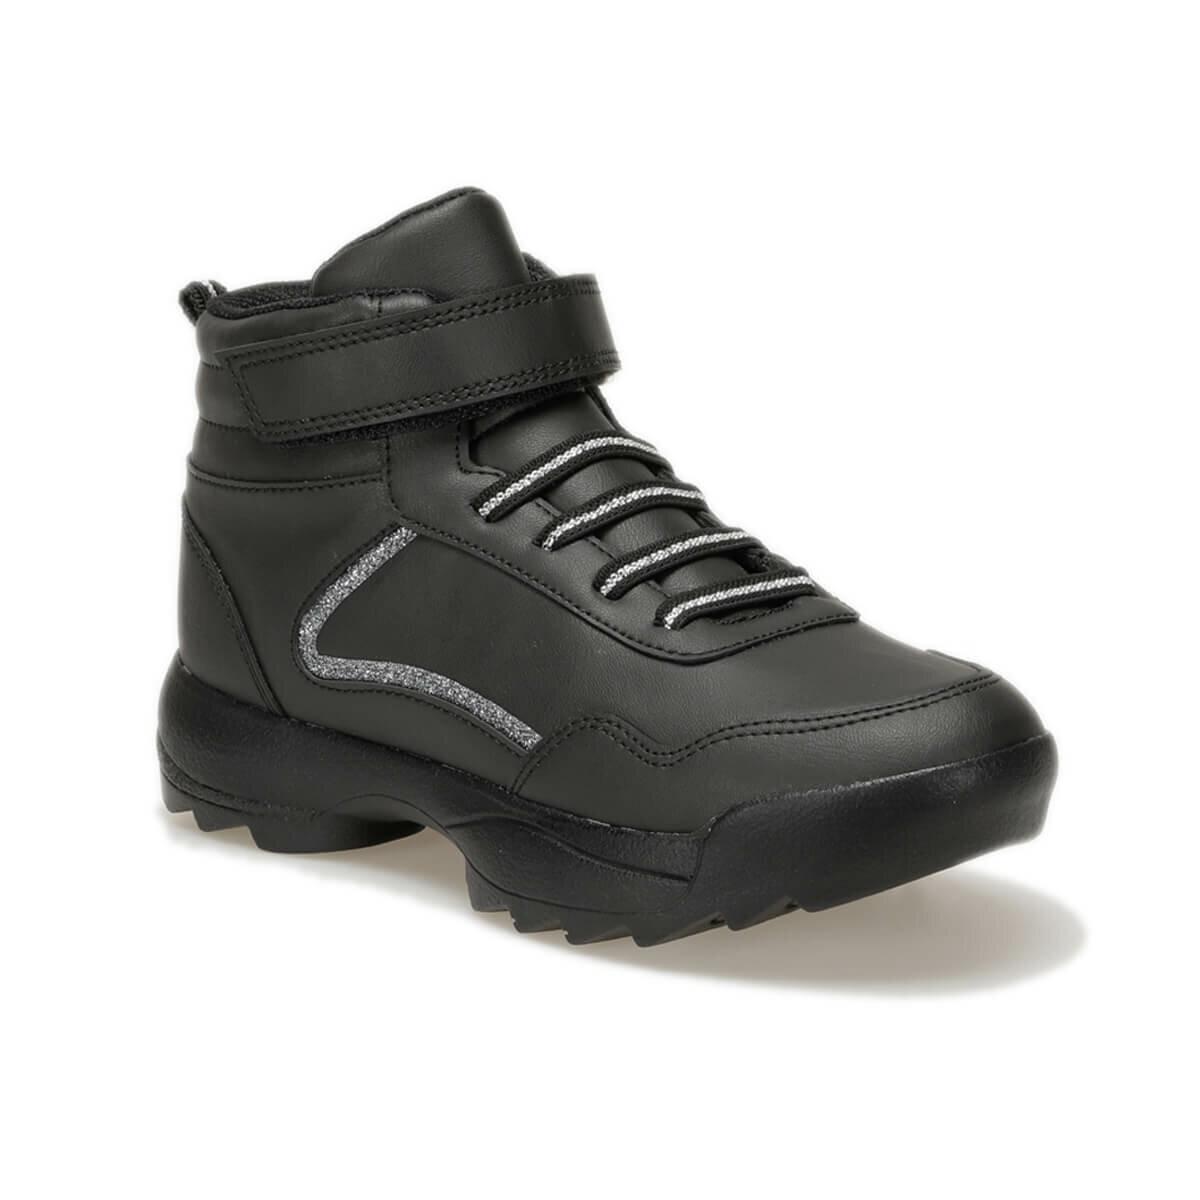 FLO FLORA HI JR Black Female Child Sneaker Shoes Torex